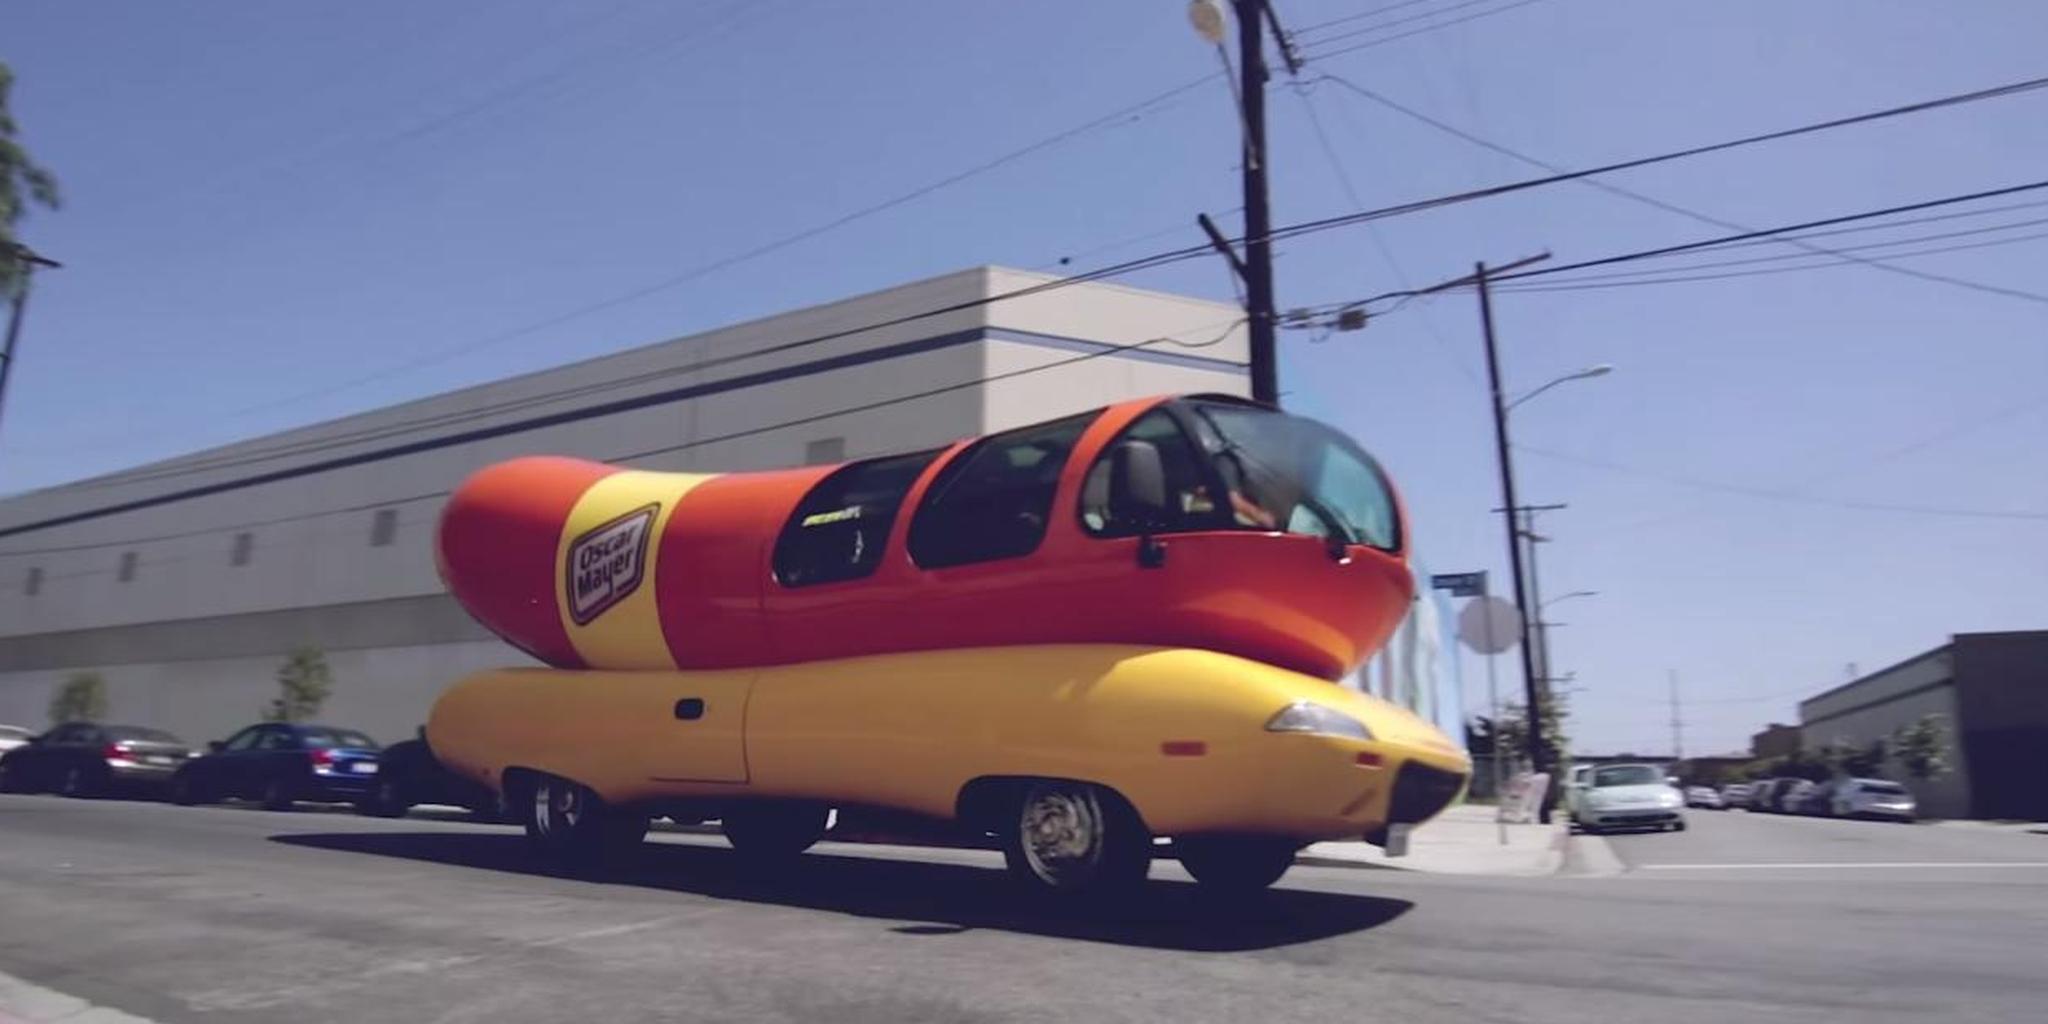 The Oscar Meyer Wienermobile